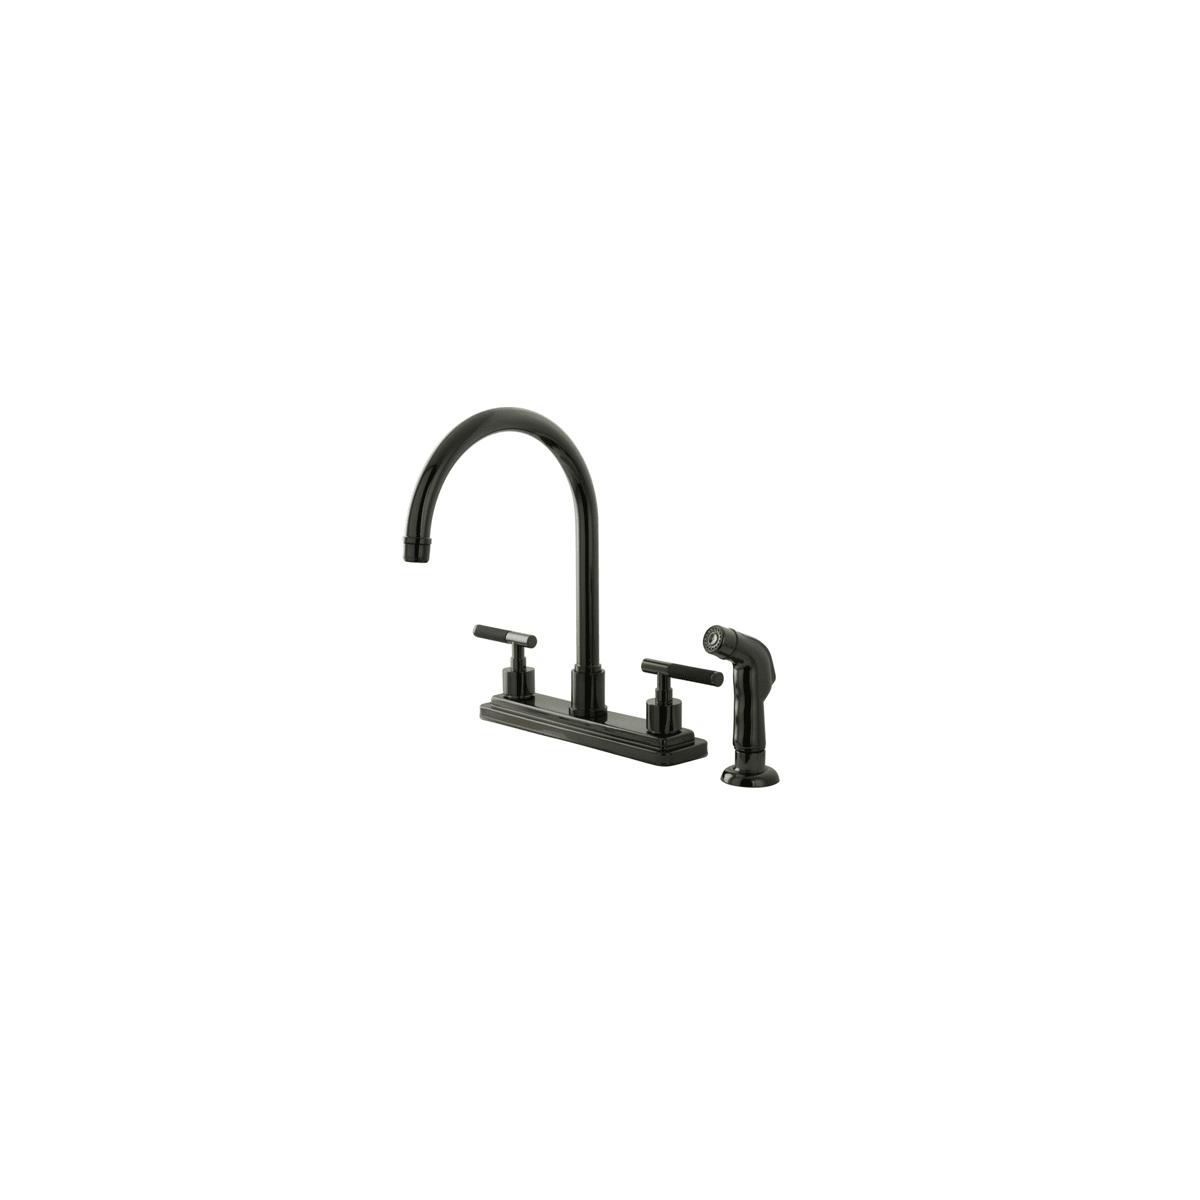 Kingston Brass Ns8790dklsp Black Onyx Water Onyx Brass Kitchen Faucet Includes Side Spray Faucet Com